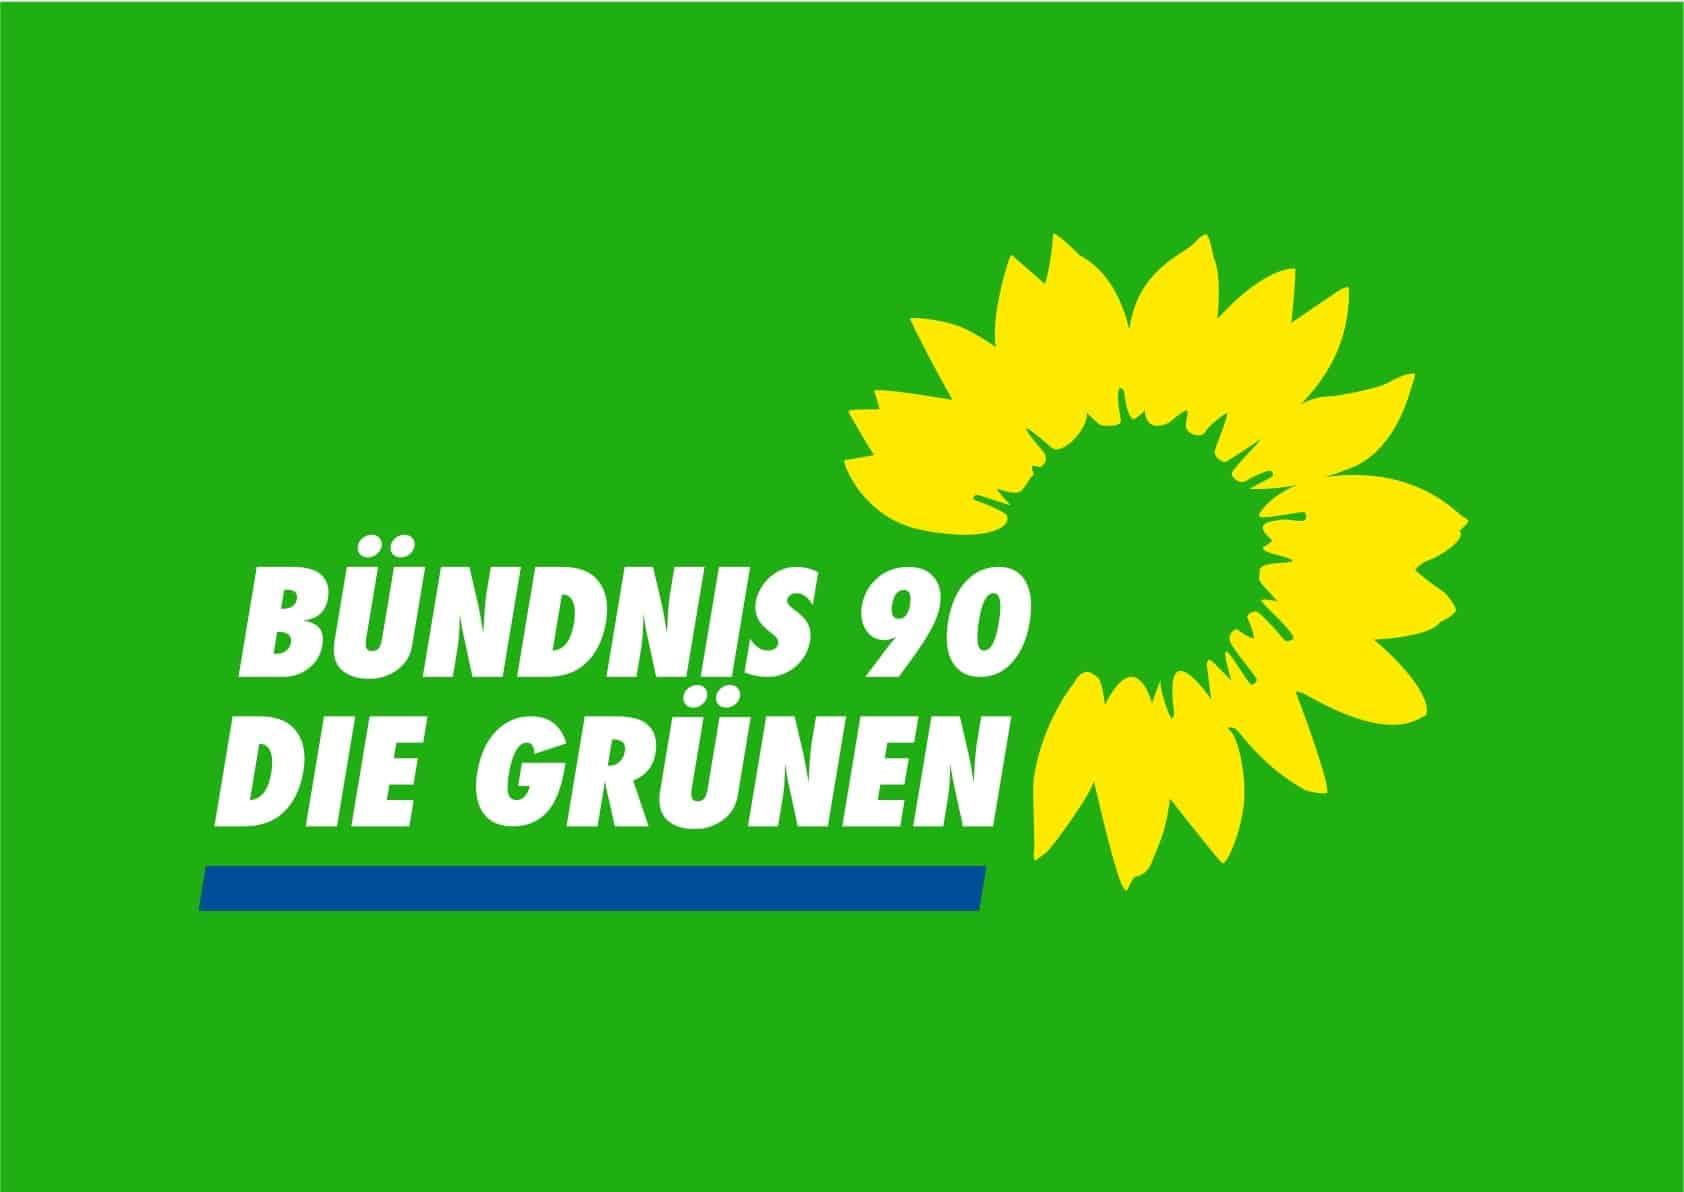 GRÜNE Logo 4farb auf grün